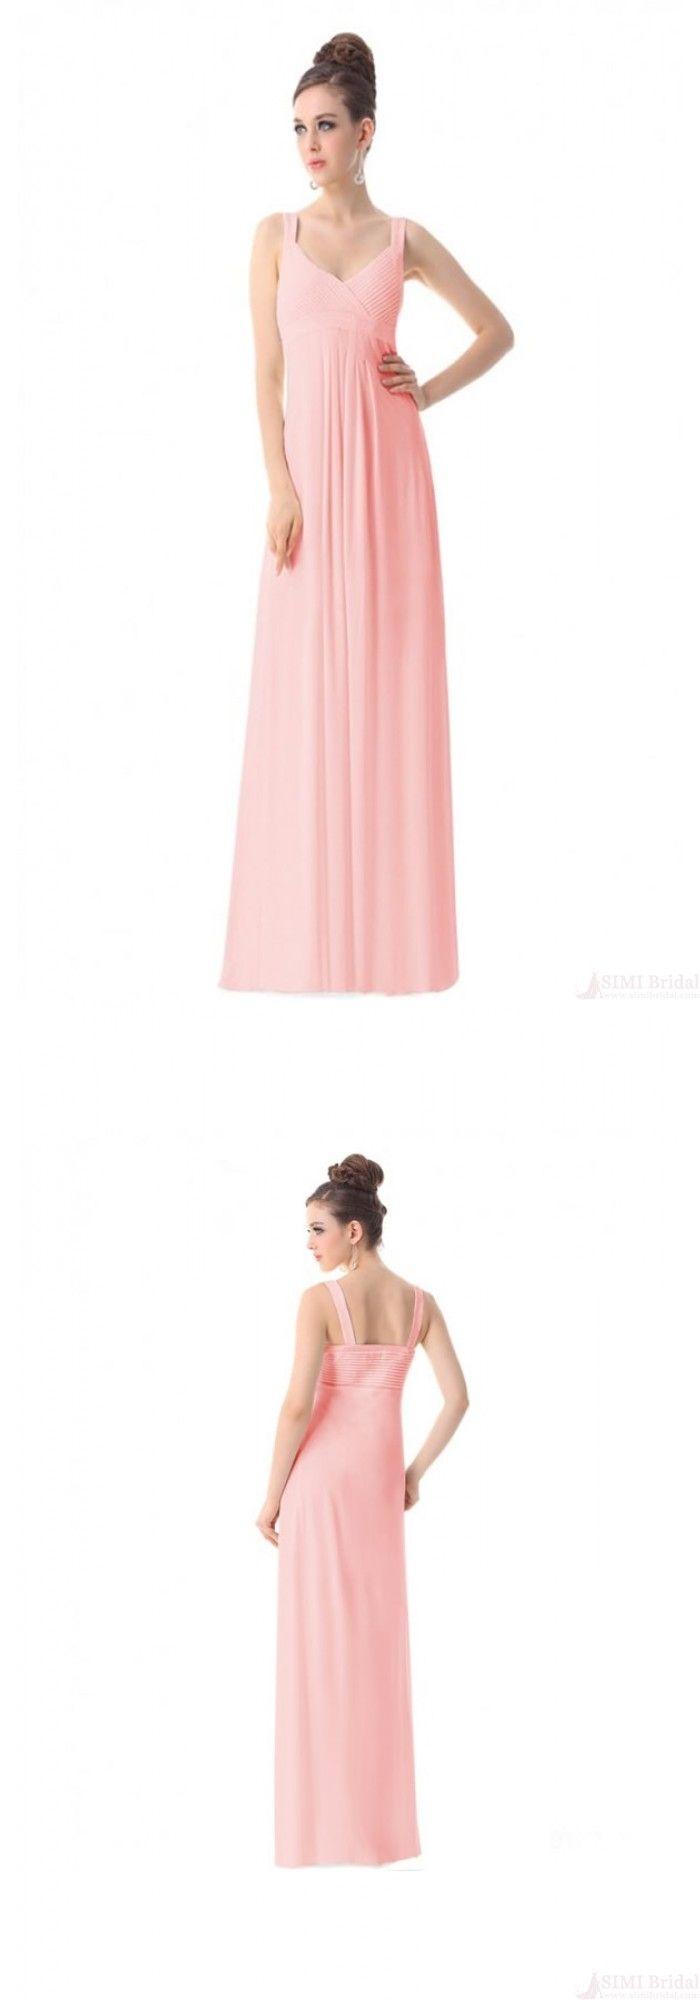 114 best 2016 Prom Dresses images on Pinterest | Prom dresses, Ball ...